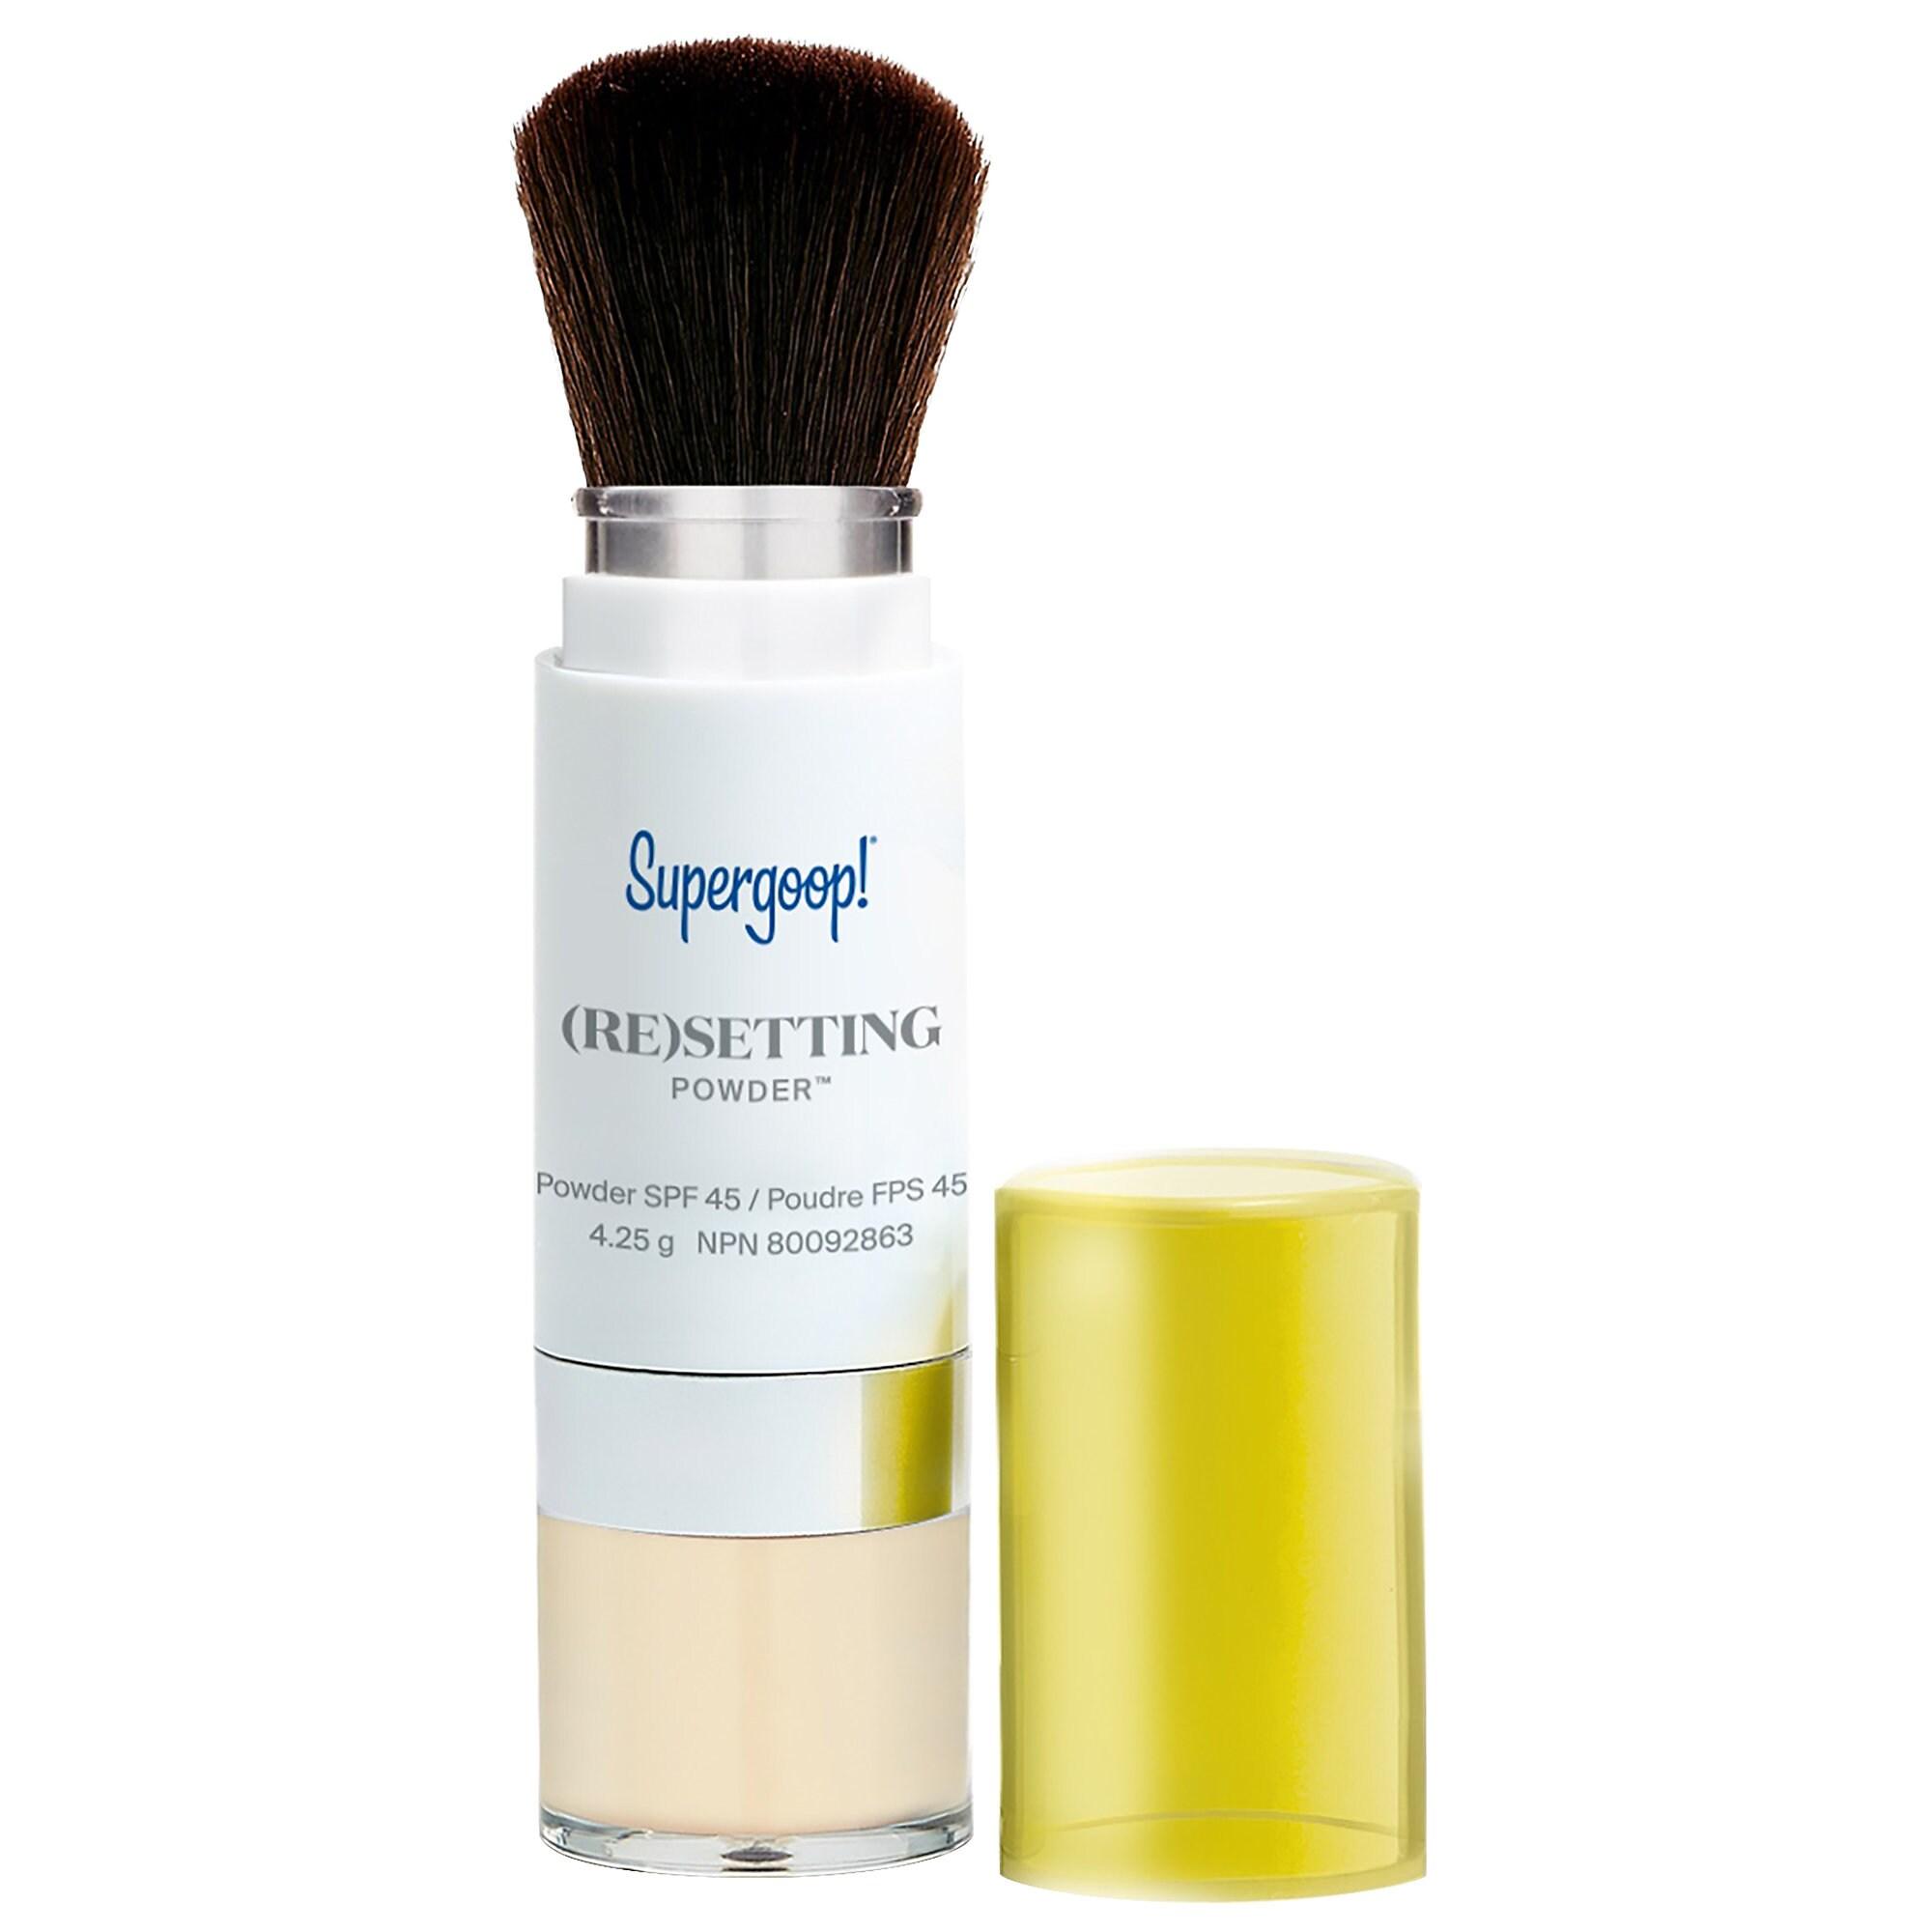 Supergoop! - (Re)setting 100% Mineral Powder SPF 45